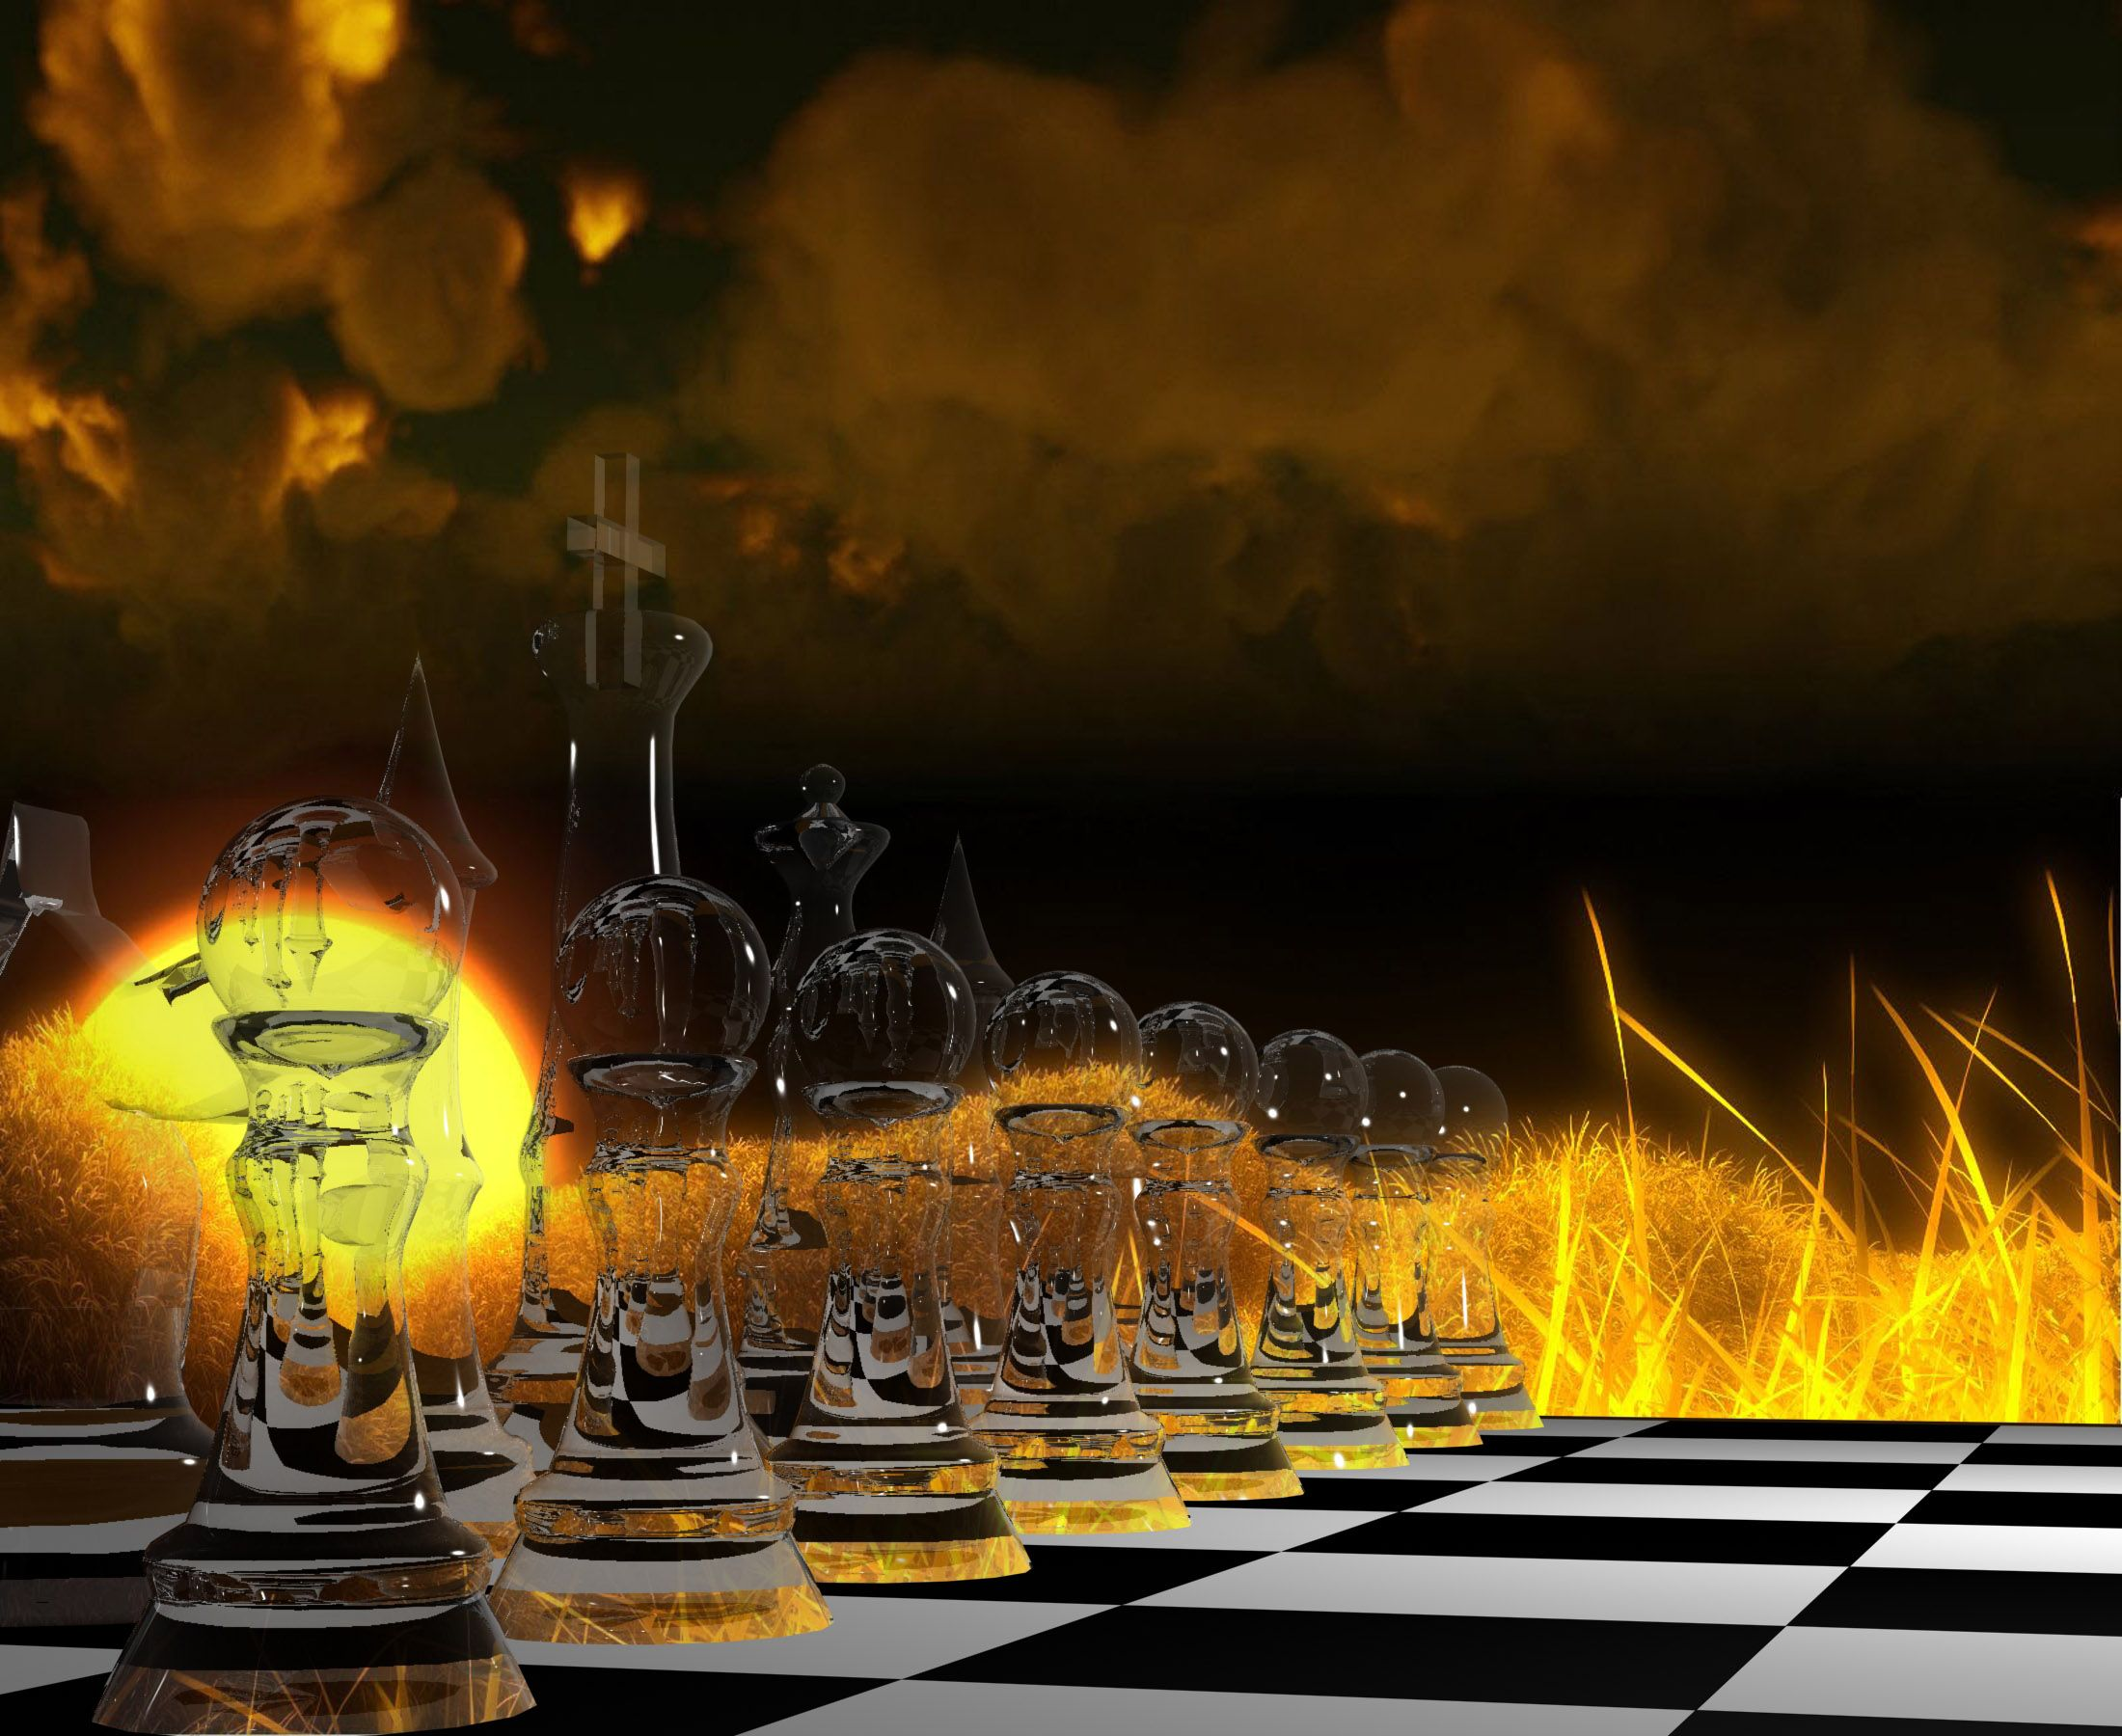 Hd chess wallpaper chess wallpapers hd pinterest chess hd chess wallpaper voltagebd Images